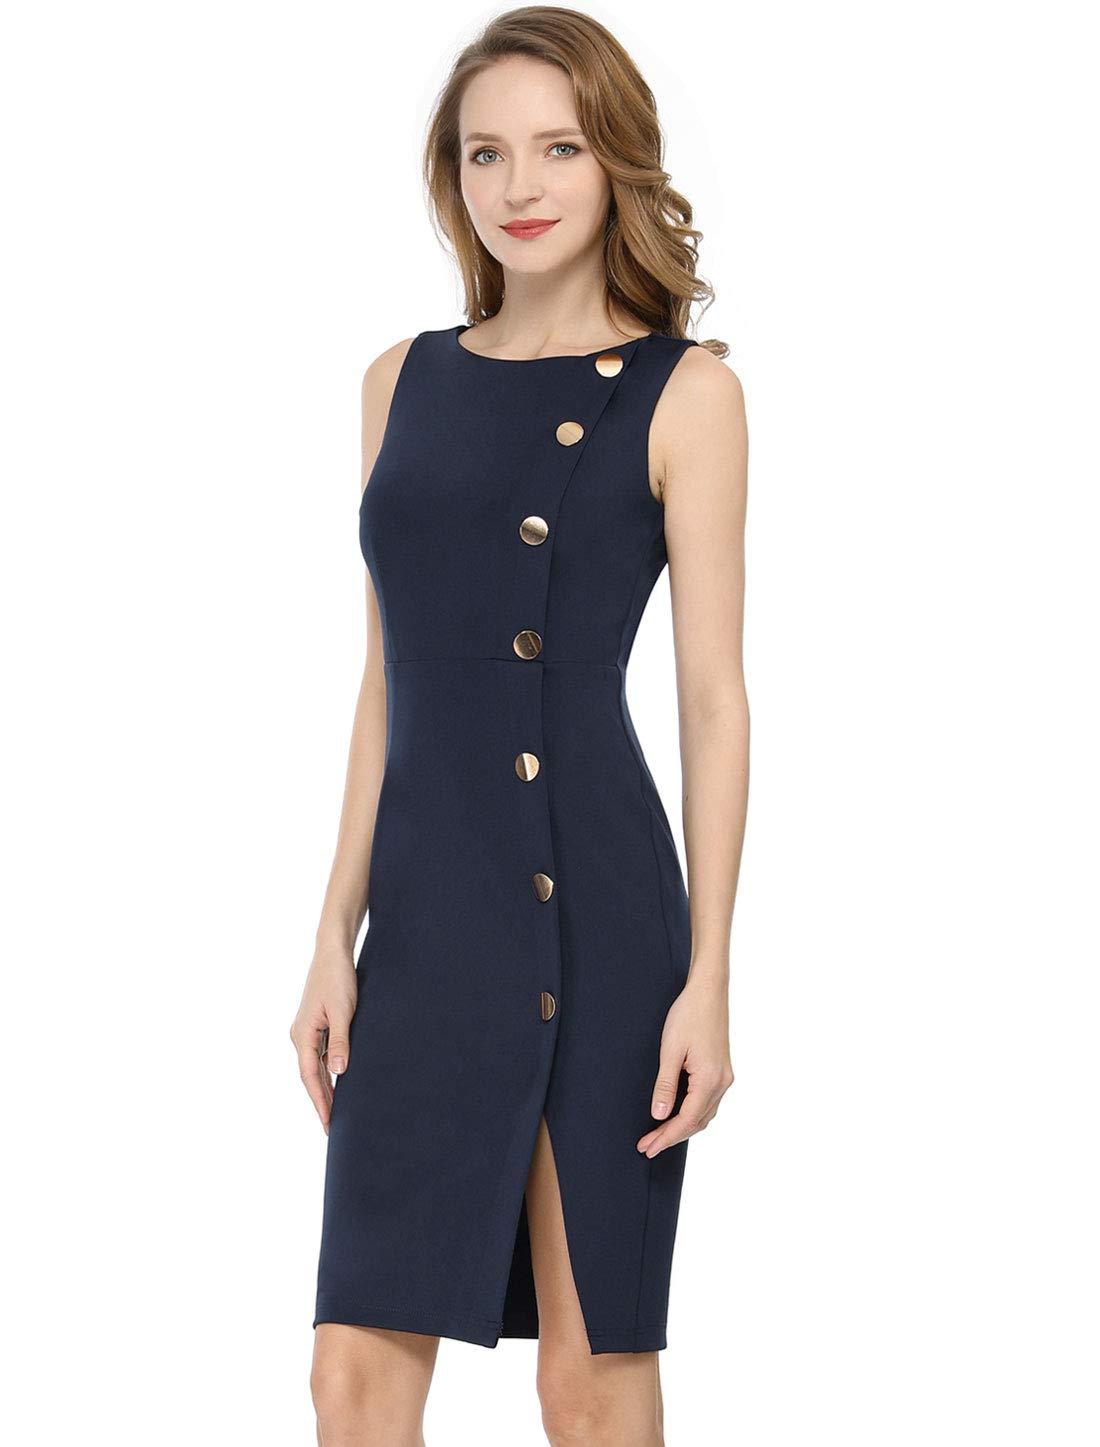 Allegra K Women's Button Decor Sleeveless Slit Stretchy Office Bodycon Sheath Dress